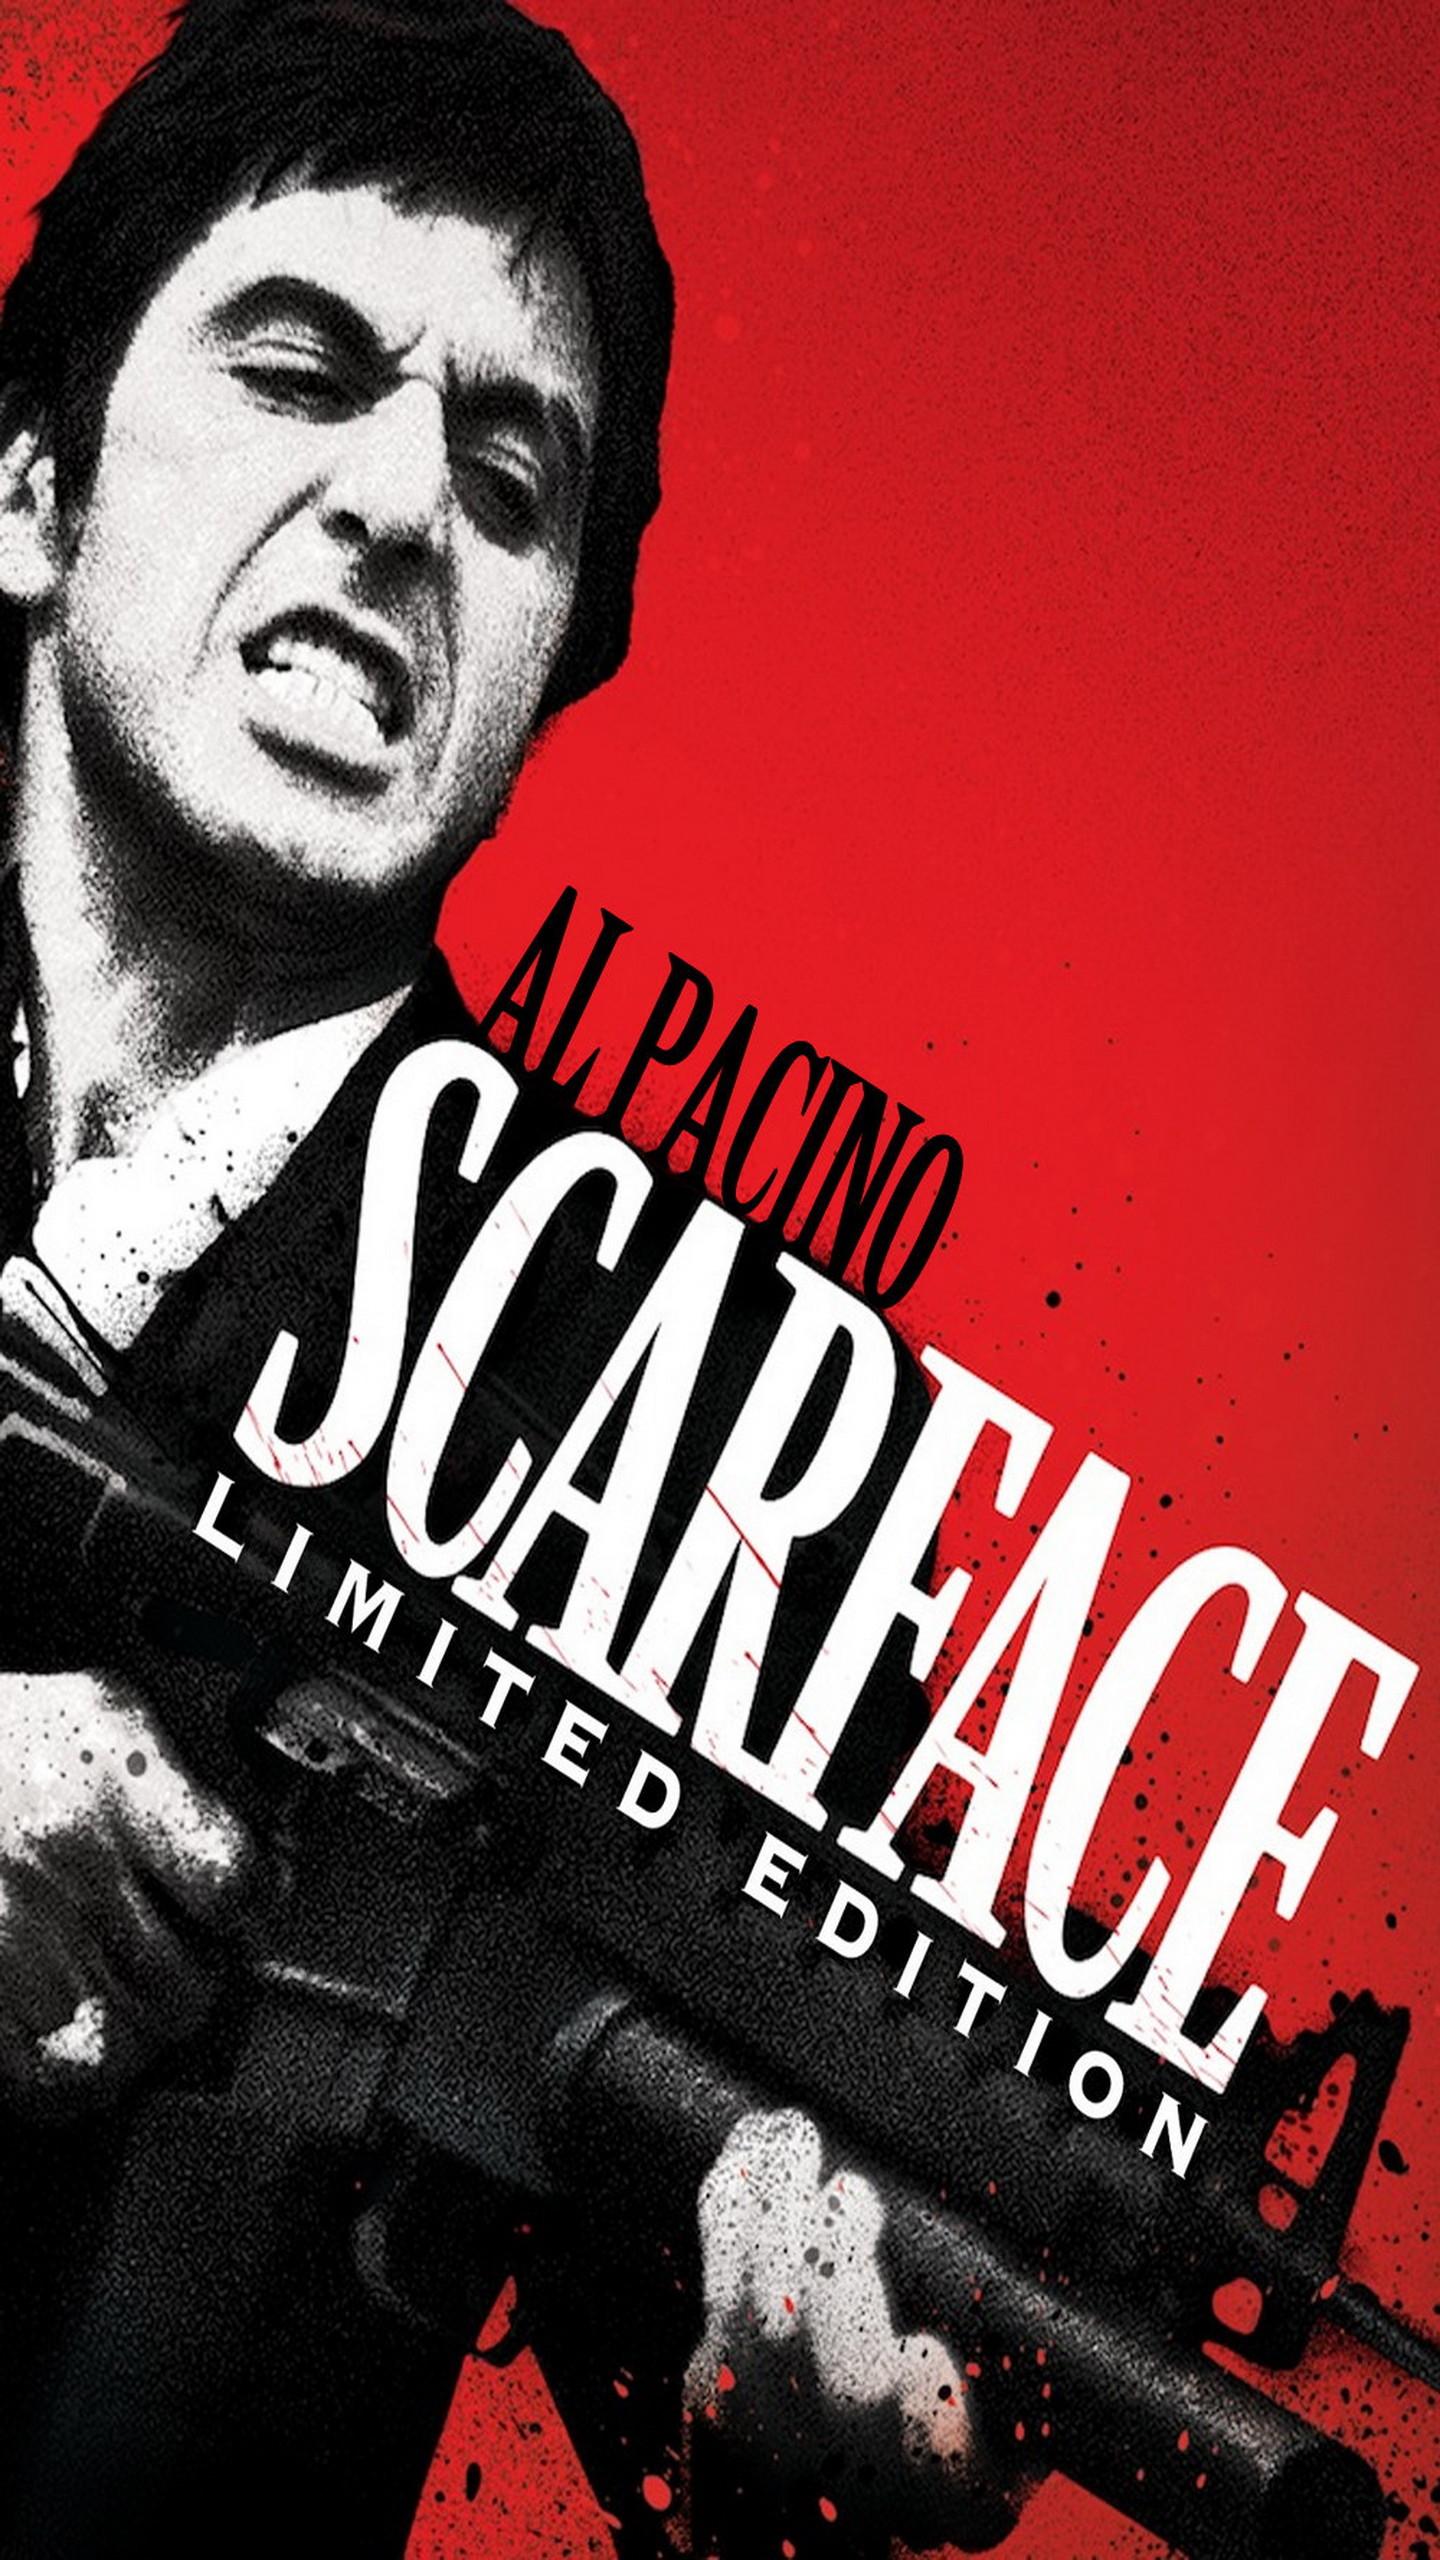 Scarface Lol